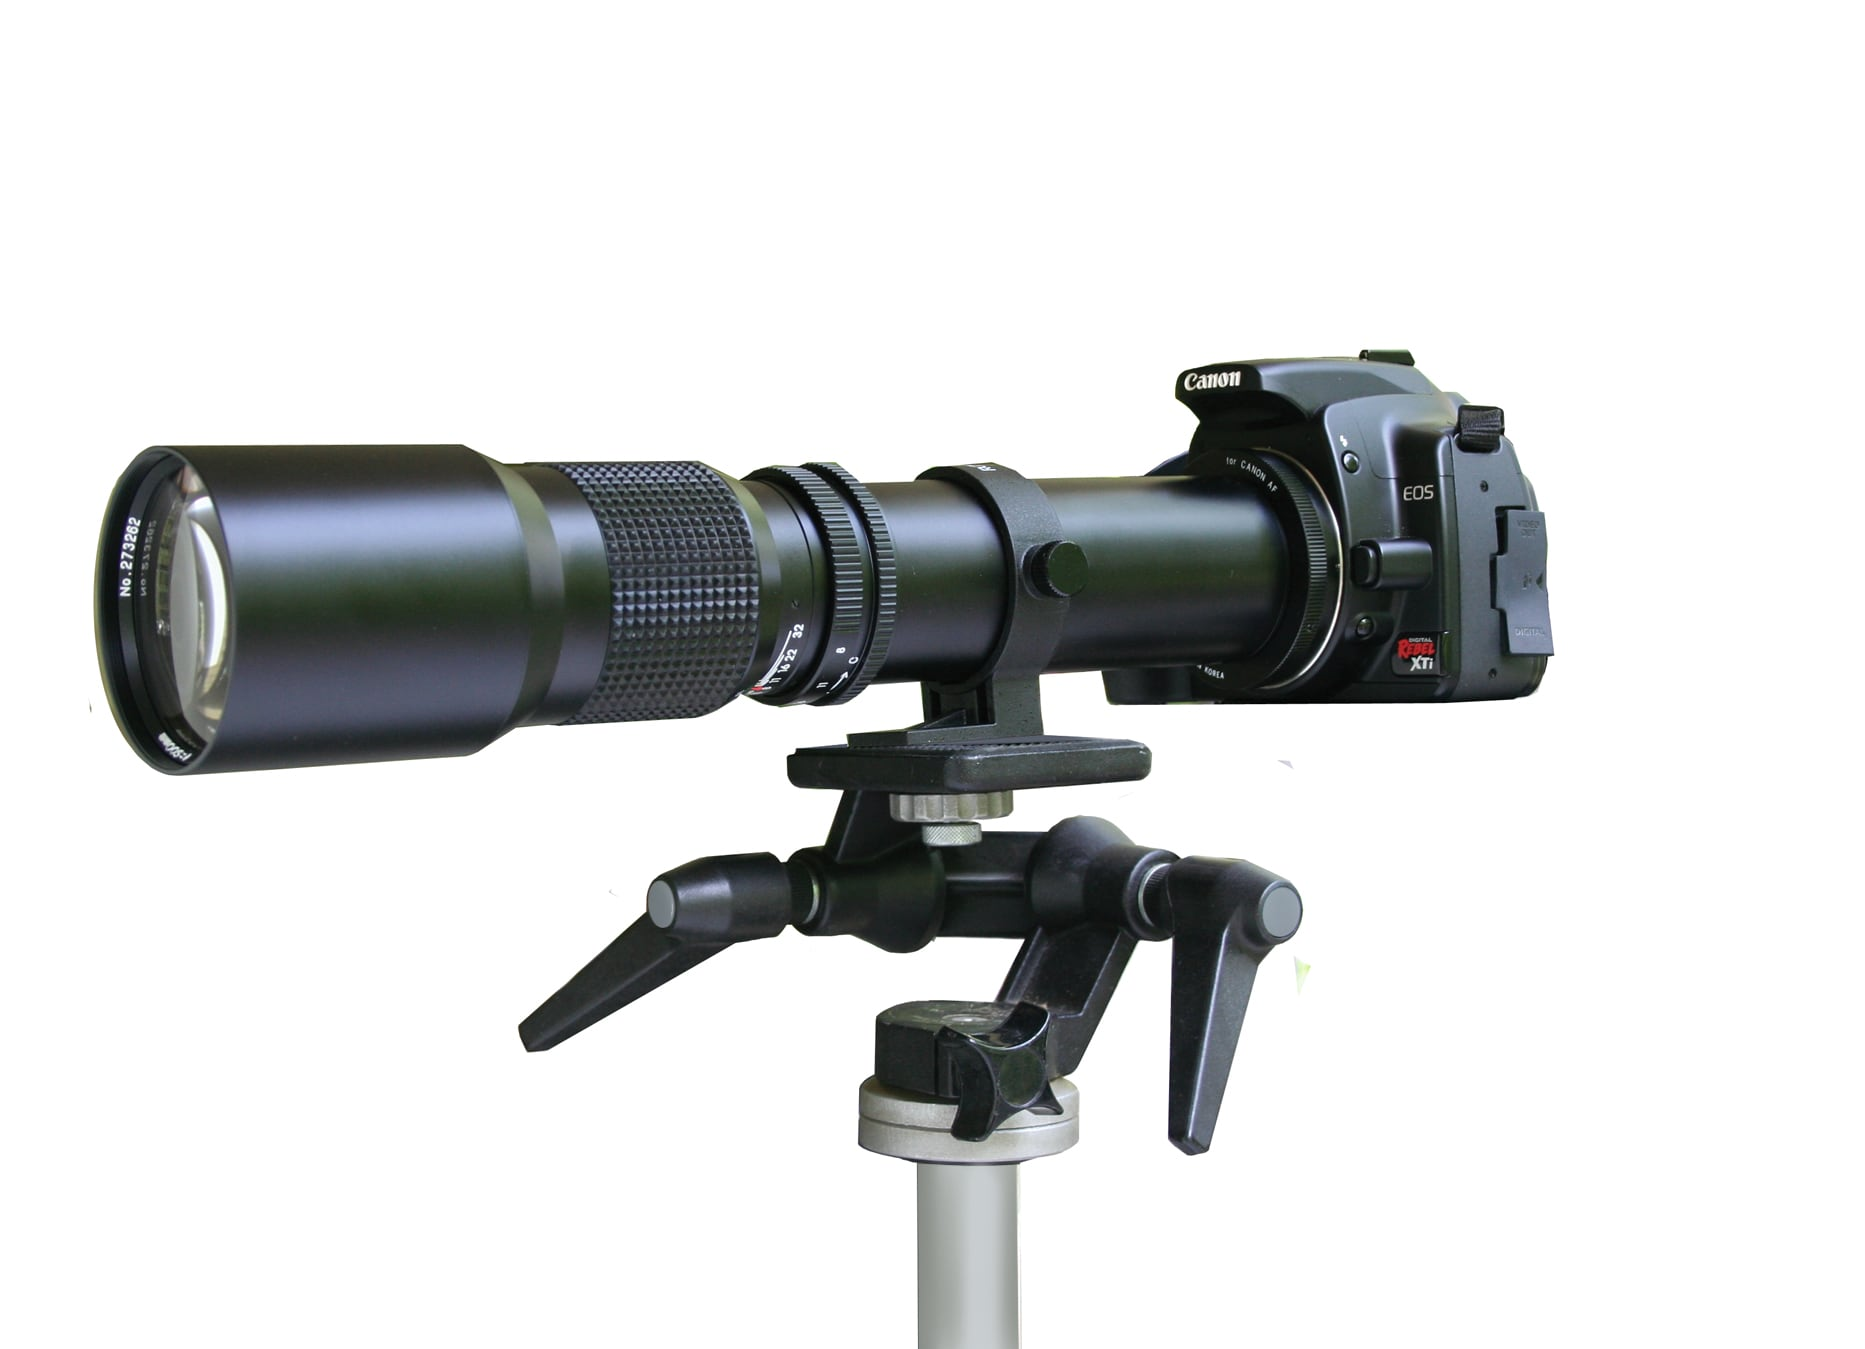 Rokinon 500mm/1000mm Telephoto Lens for Canon EOS